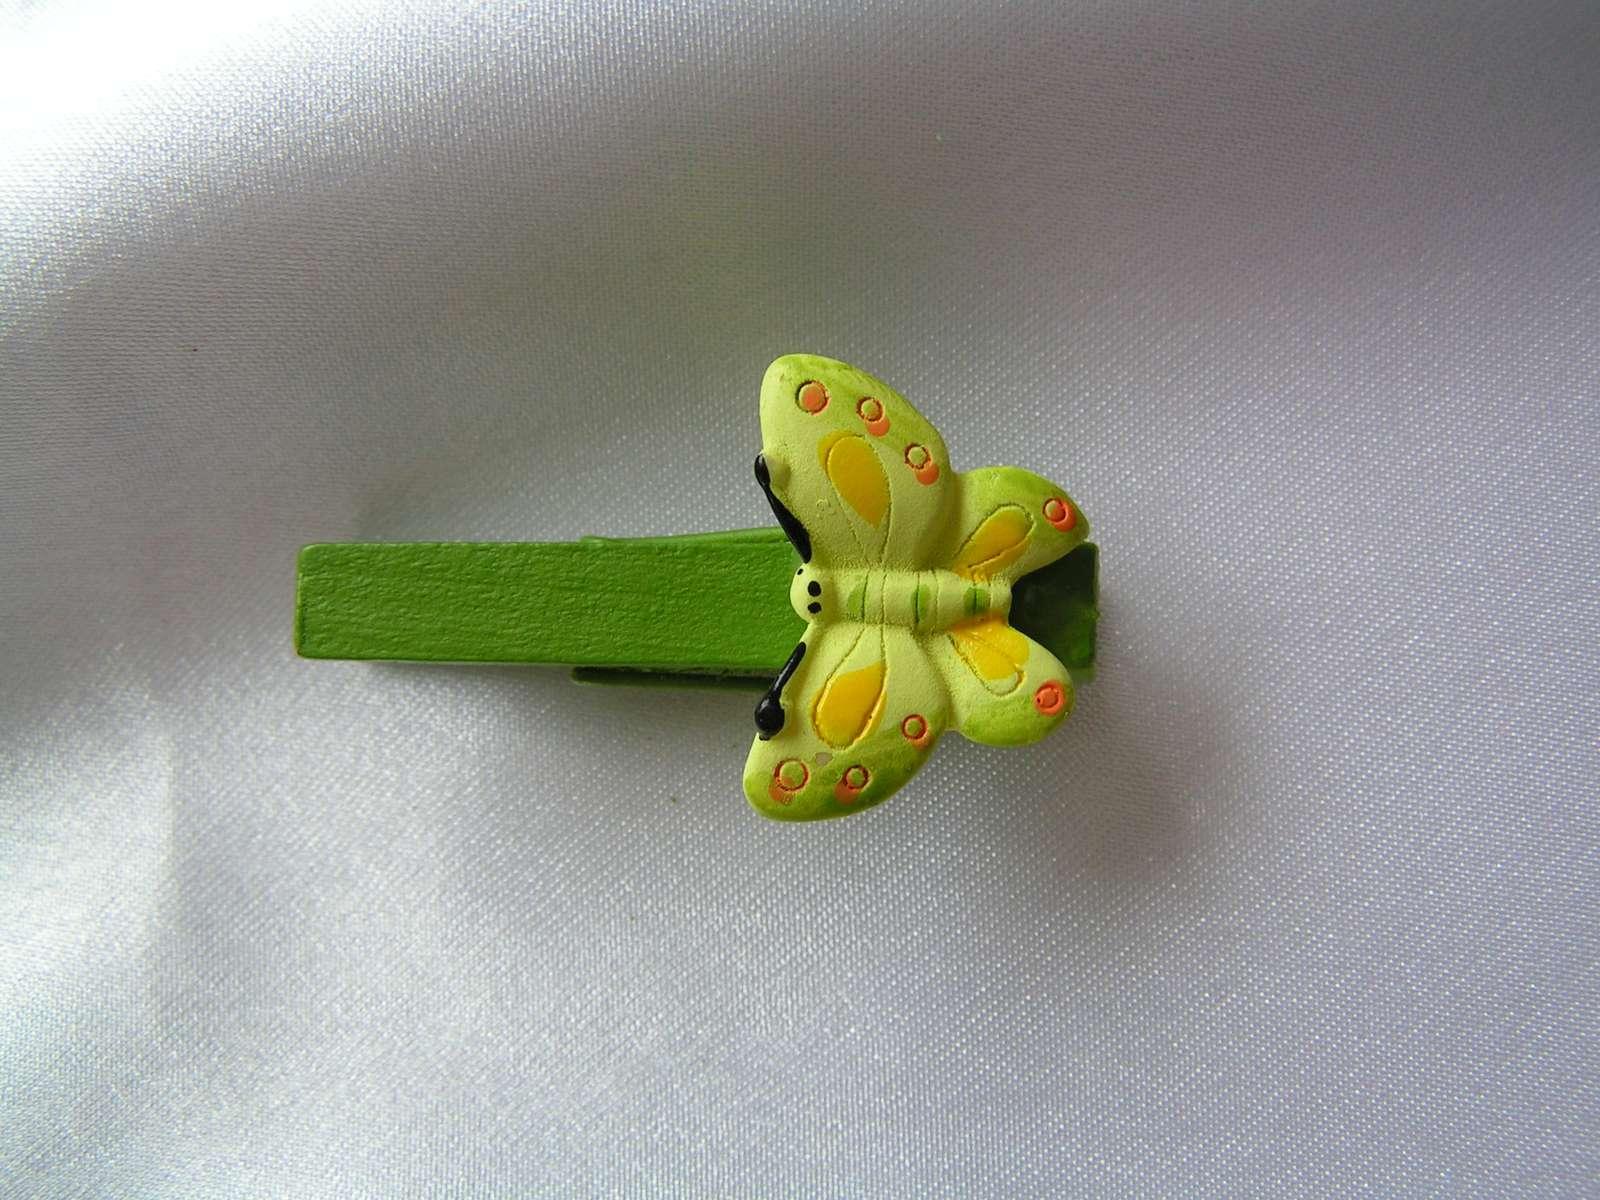 Kolíček 3,5 cm - Obrázek č. 1